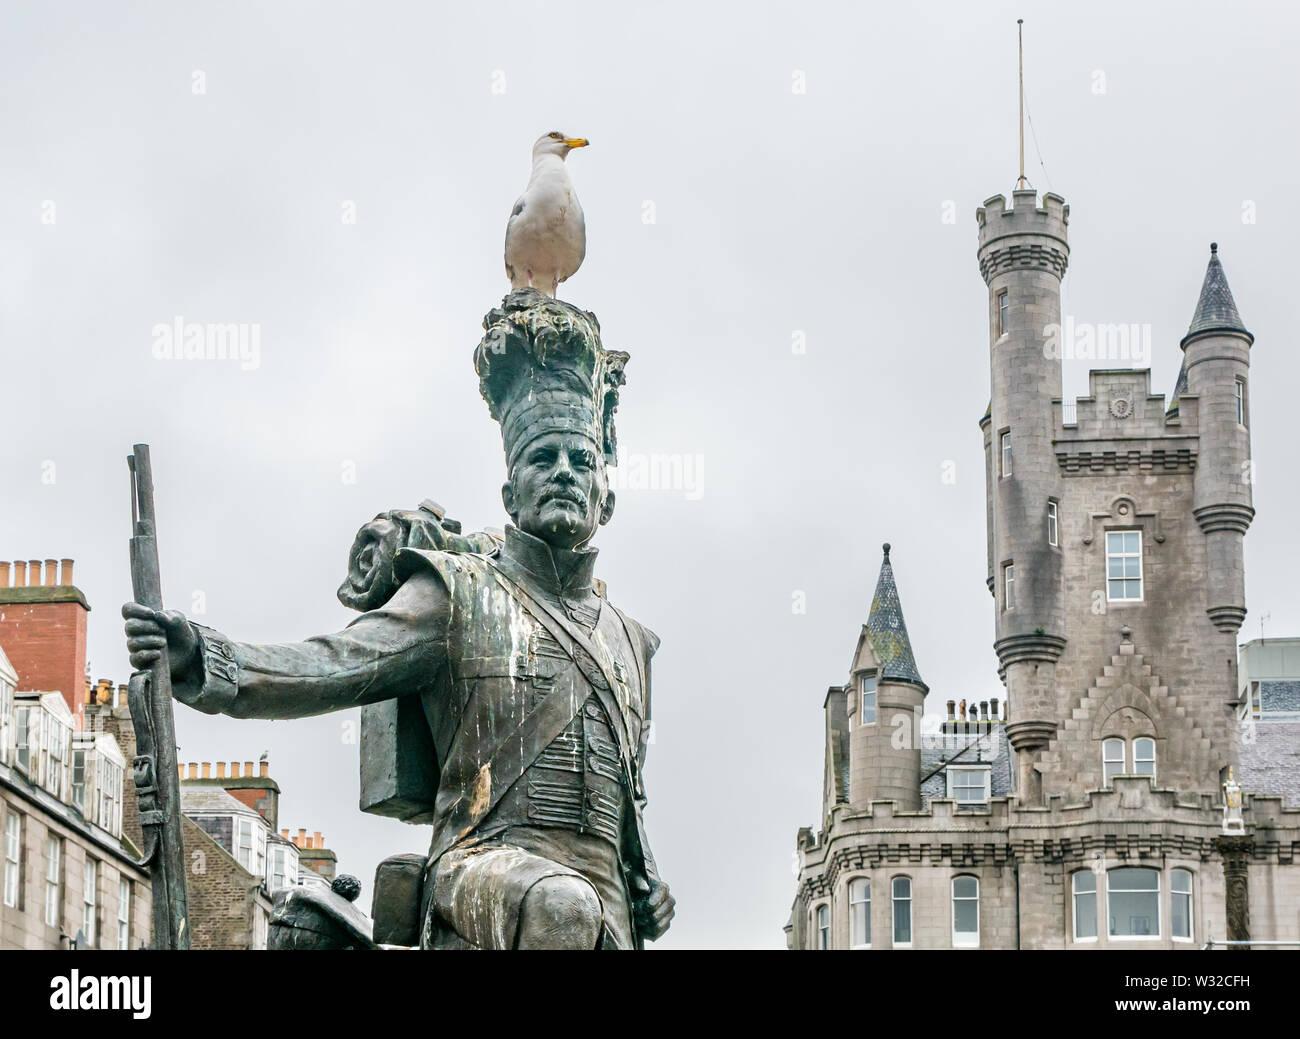 Gordon Highlanders statue by Mark Richards, Castlegate, Aberdeen, Scotland, UK with gull & Citadel building Stock Photo